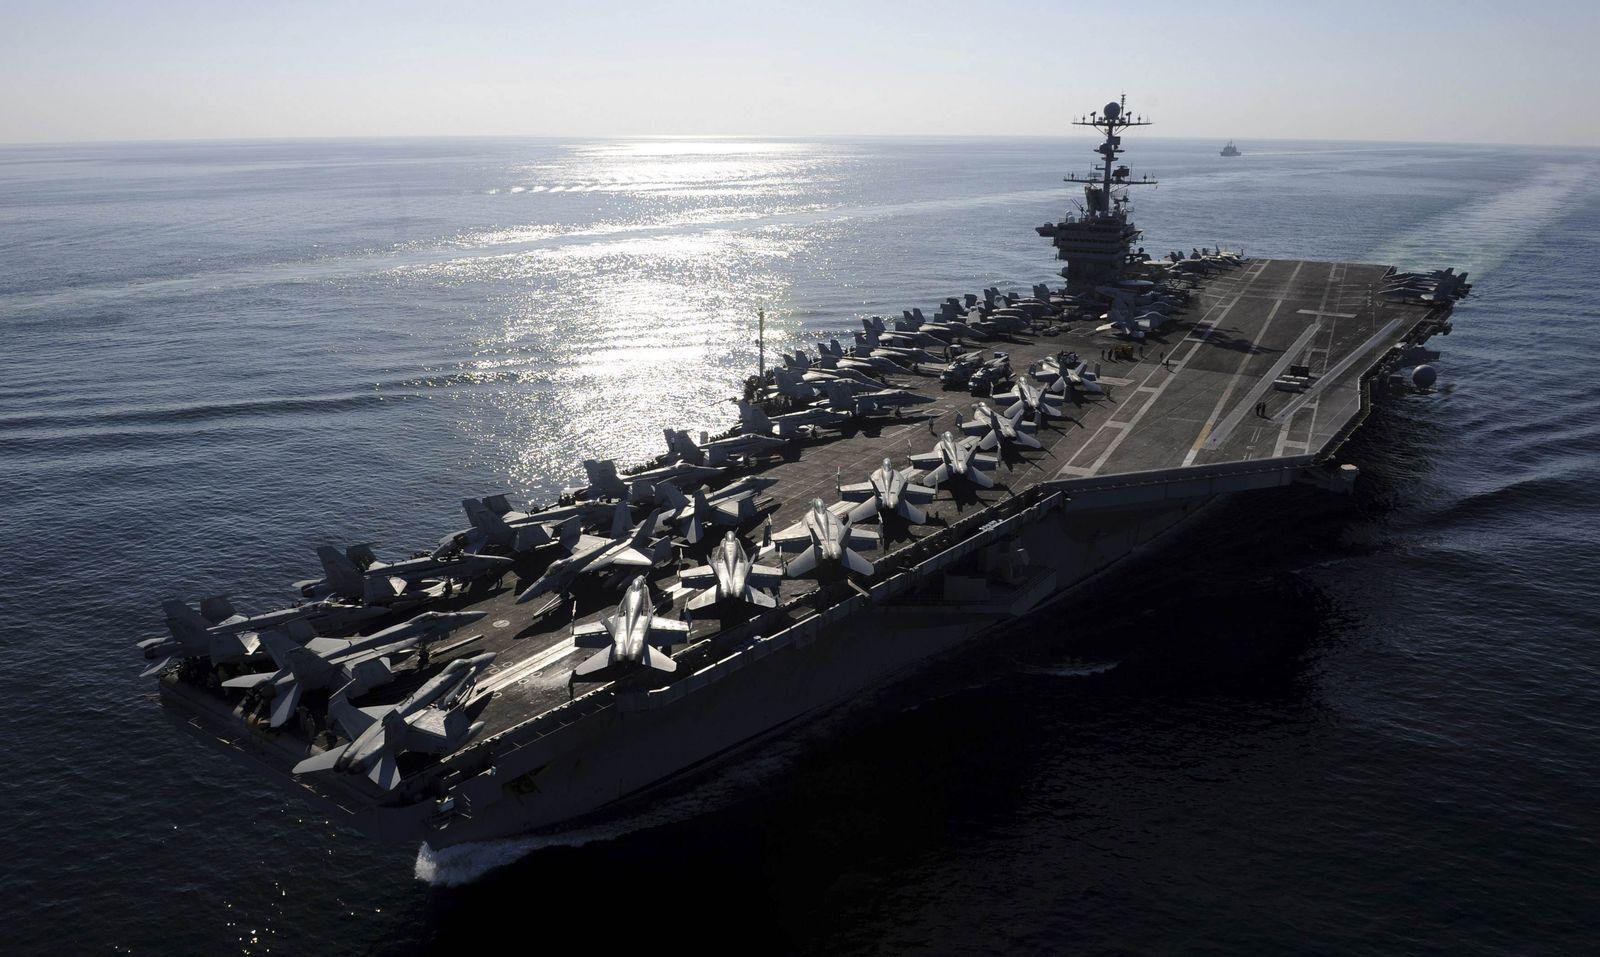 Iran / Hormuz / USS Stennis